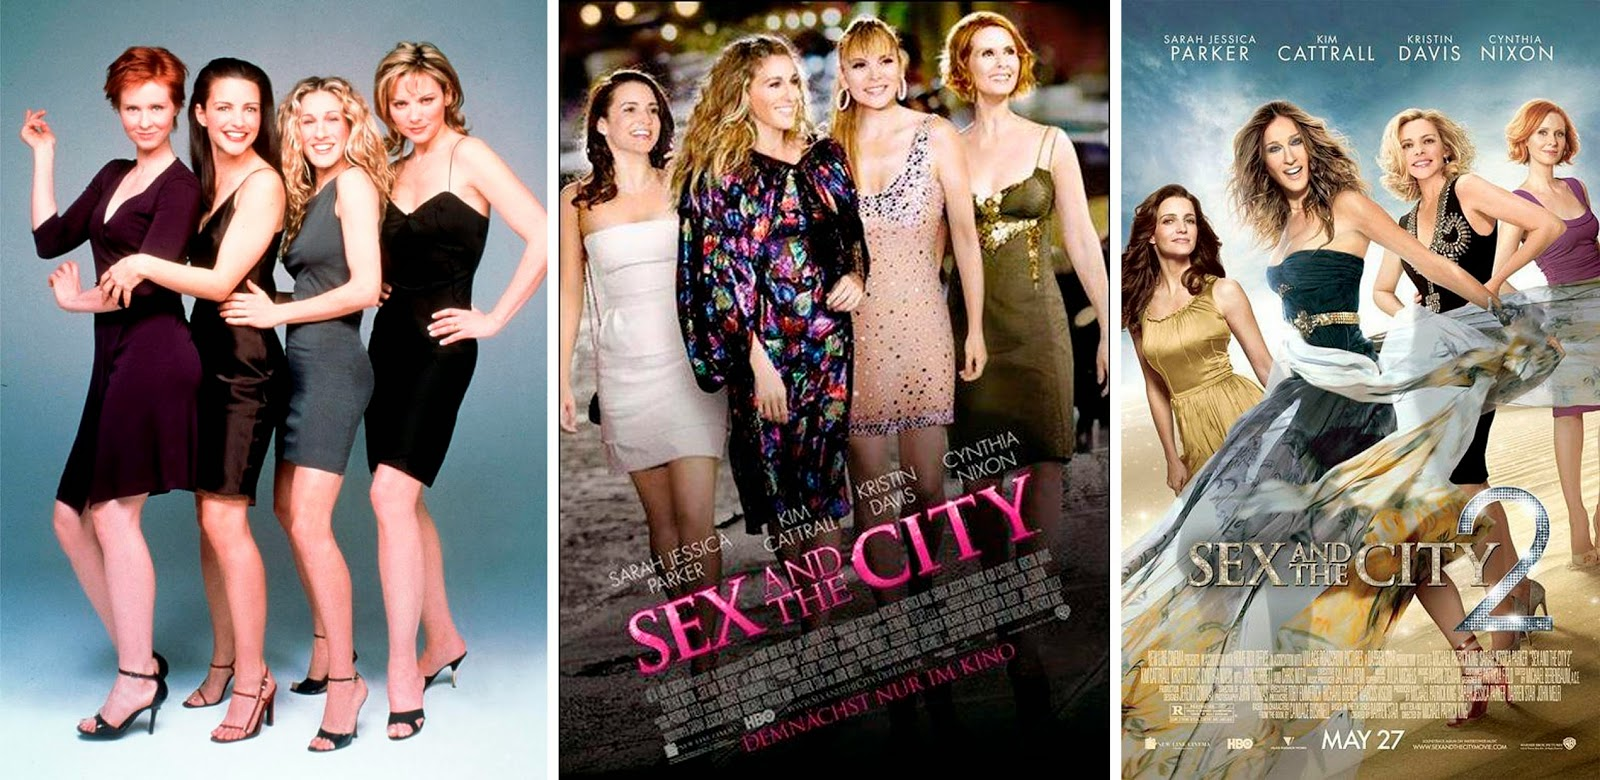 Sarah Jessica Parker (Carrie Bradshaw), Kristin Davis (Charlotte York), Cynthia Nixon (Miranda Hobbes) y Kim Cattrall (Samantha Jones)